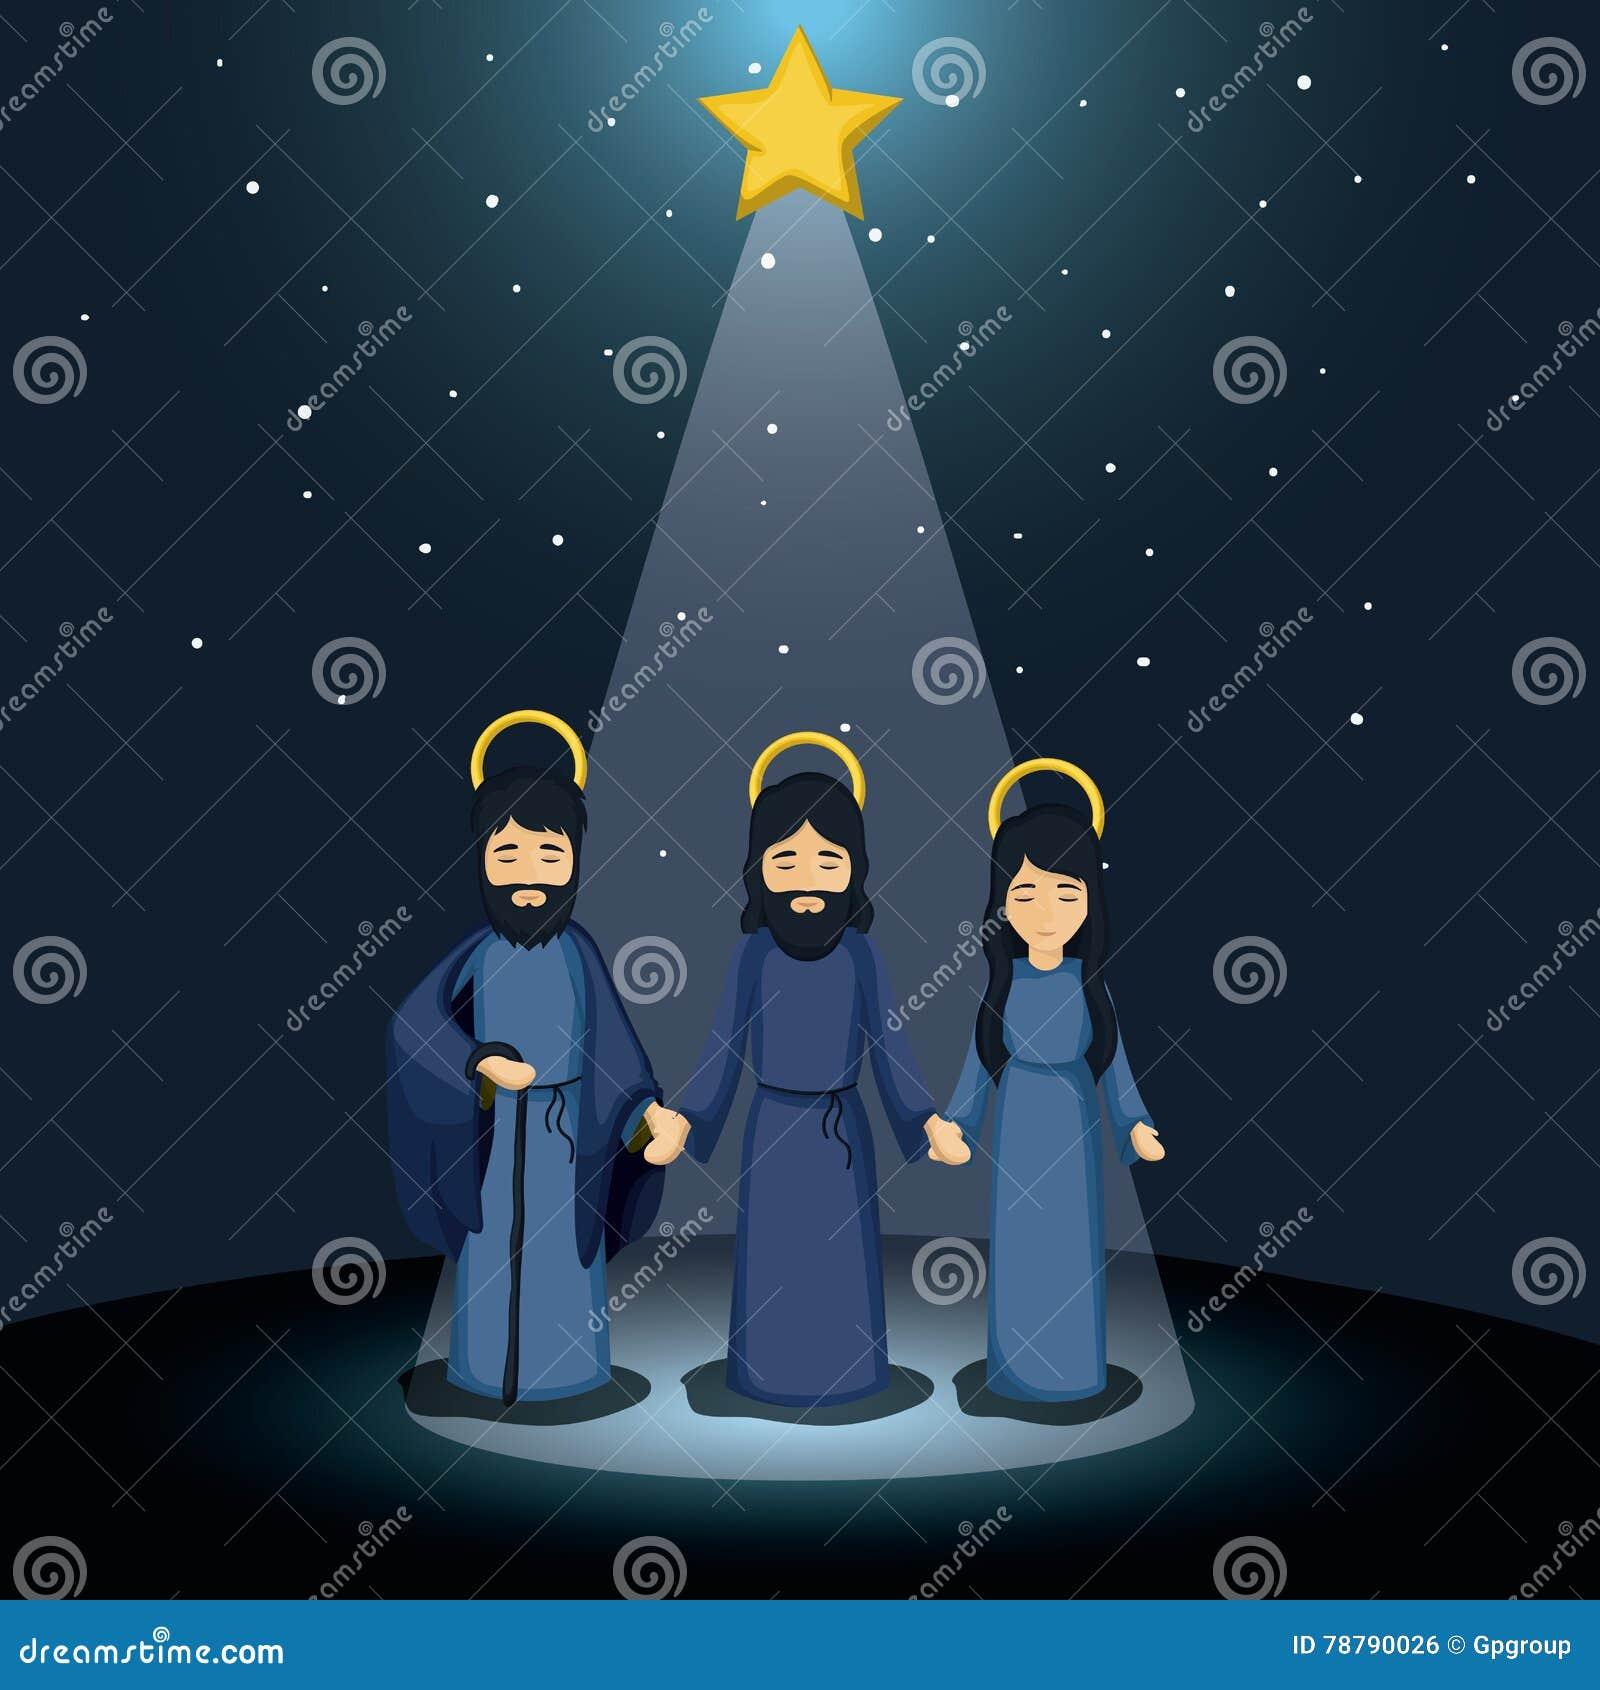 Mary Joseph And Jesus Cartoon Design Stock Vector - Illustration of ...